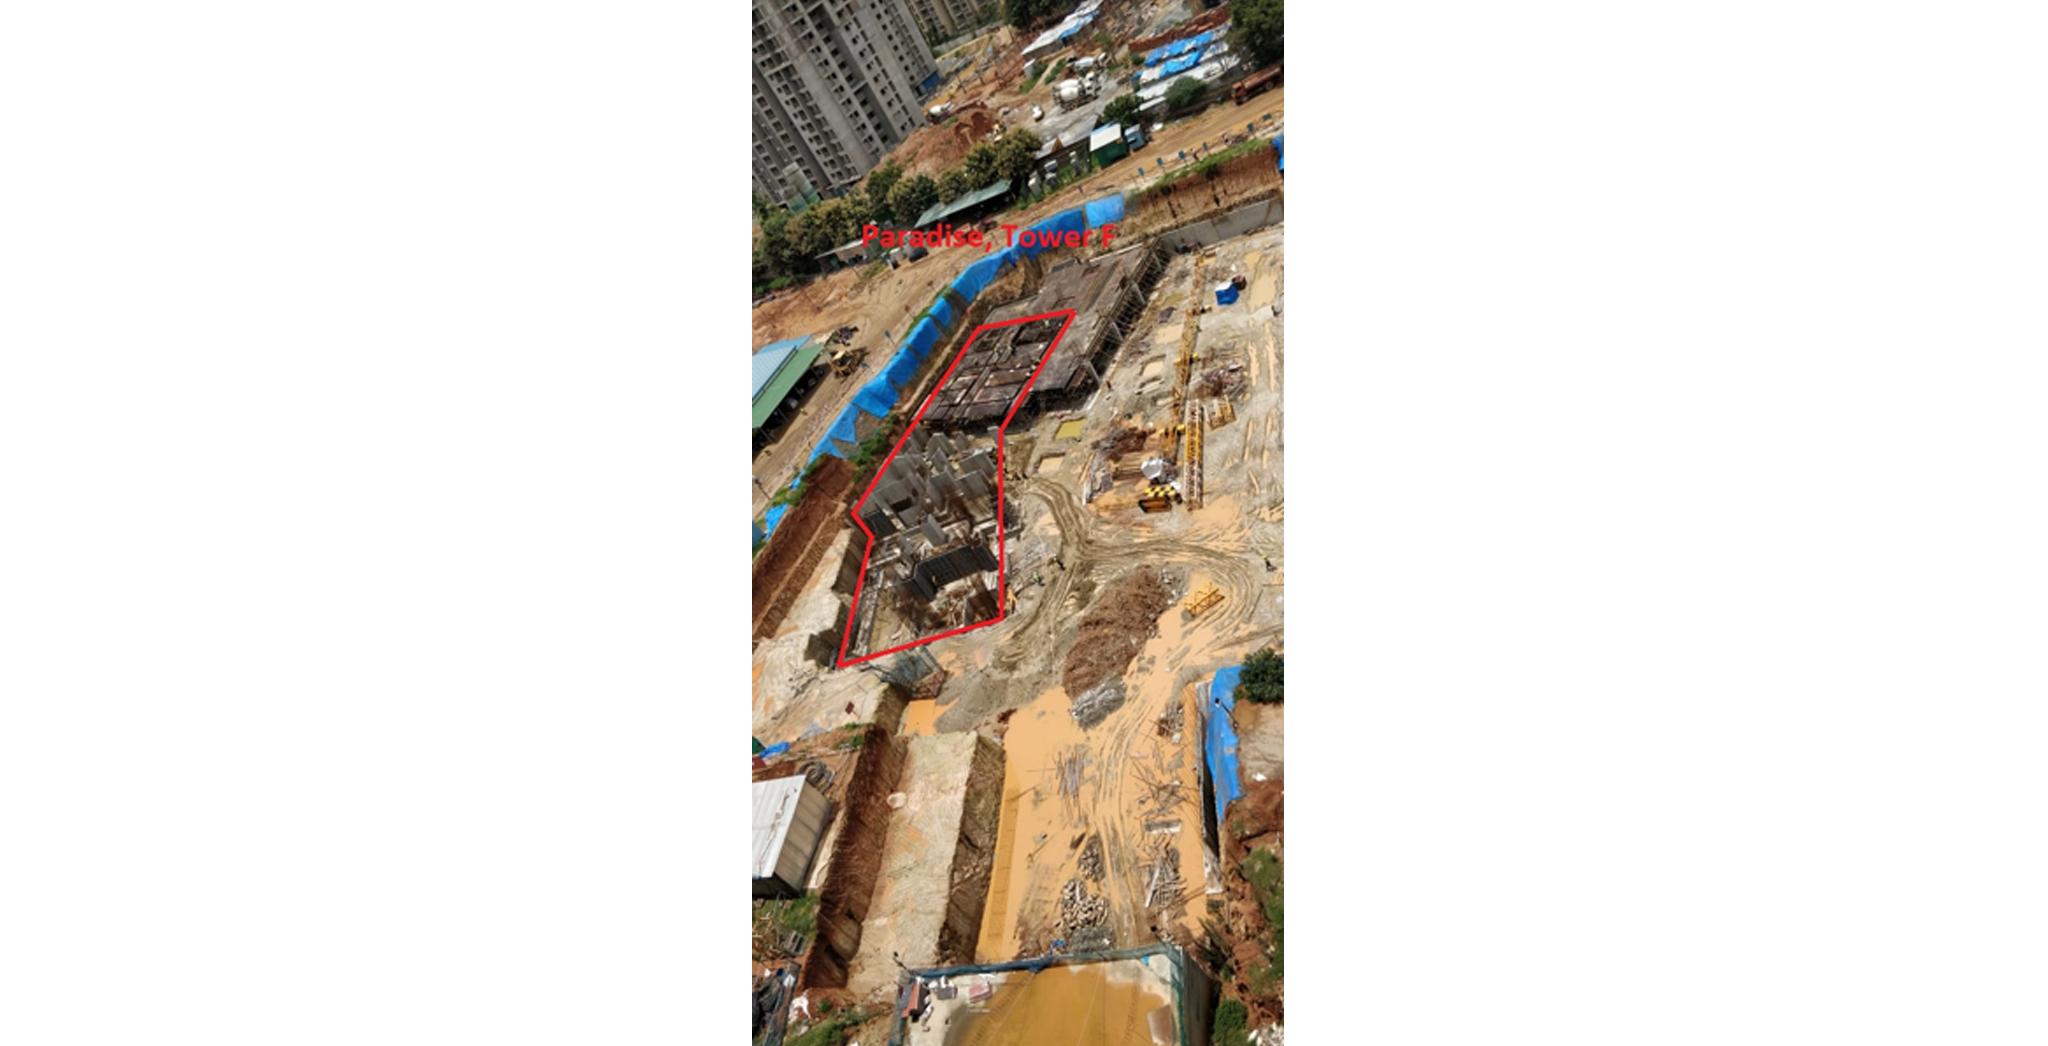 Sep 2021 - Paradise Tower F: Casting of Raft/Footing Milestone